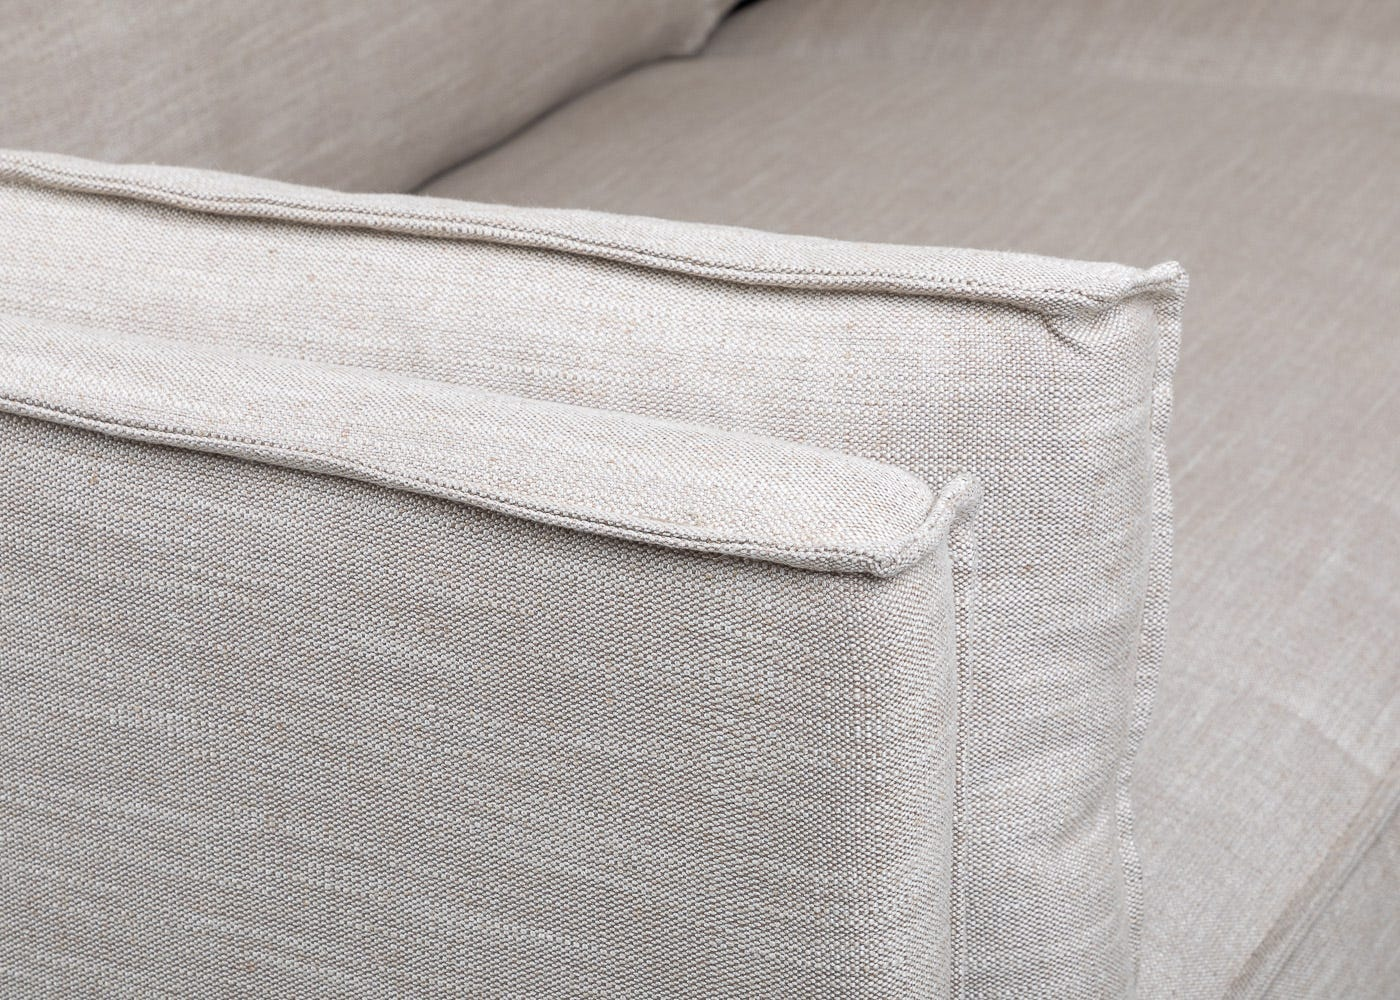 Tortona 3 Seater Sofa in Broad Weave Putty - Arm